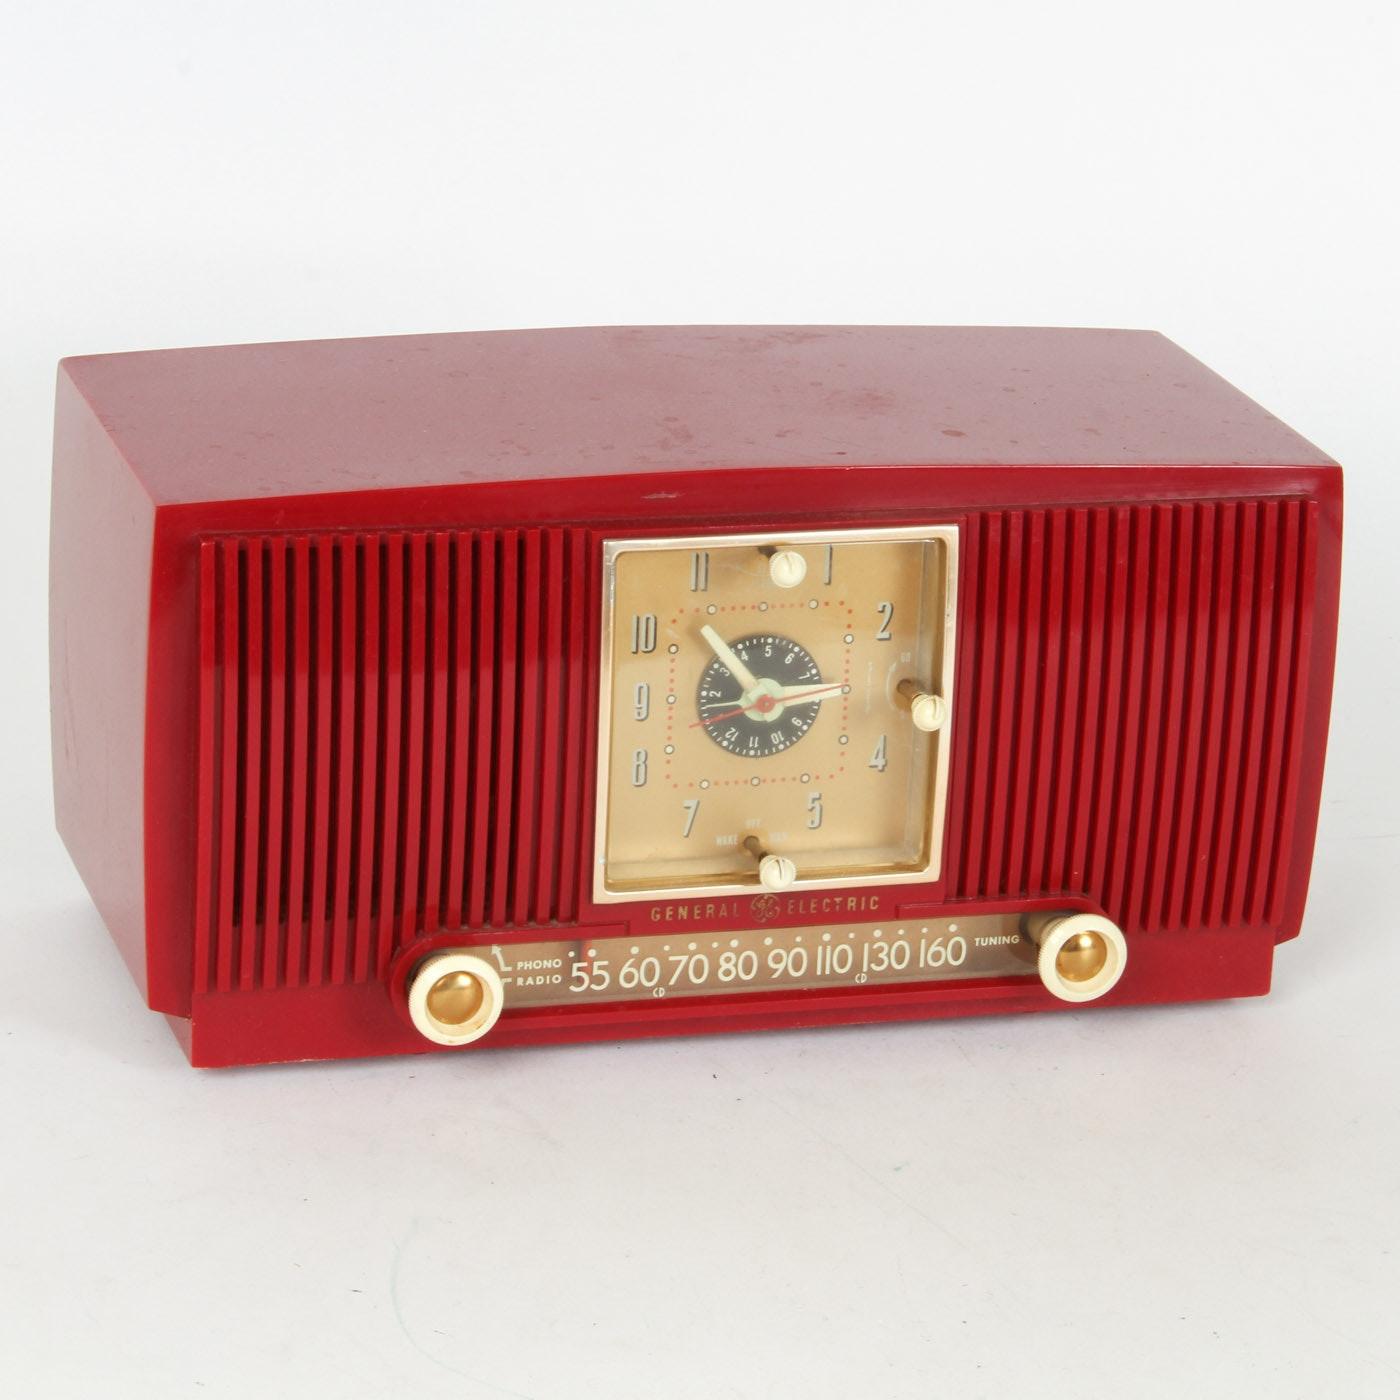 Vintage General Electric Clock Radio | EBTH